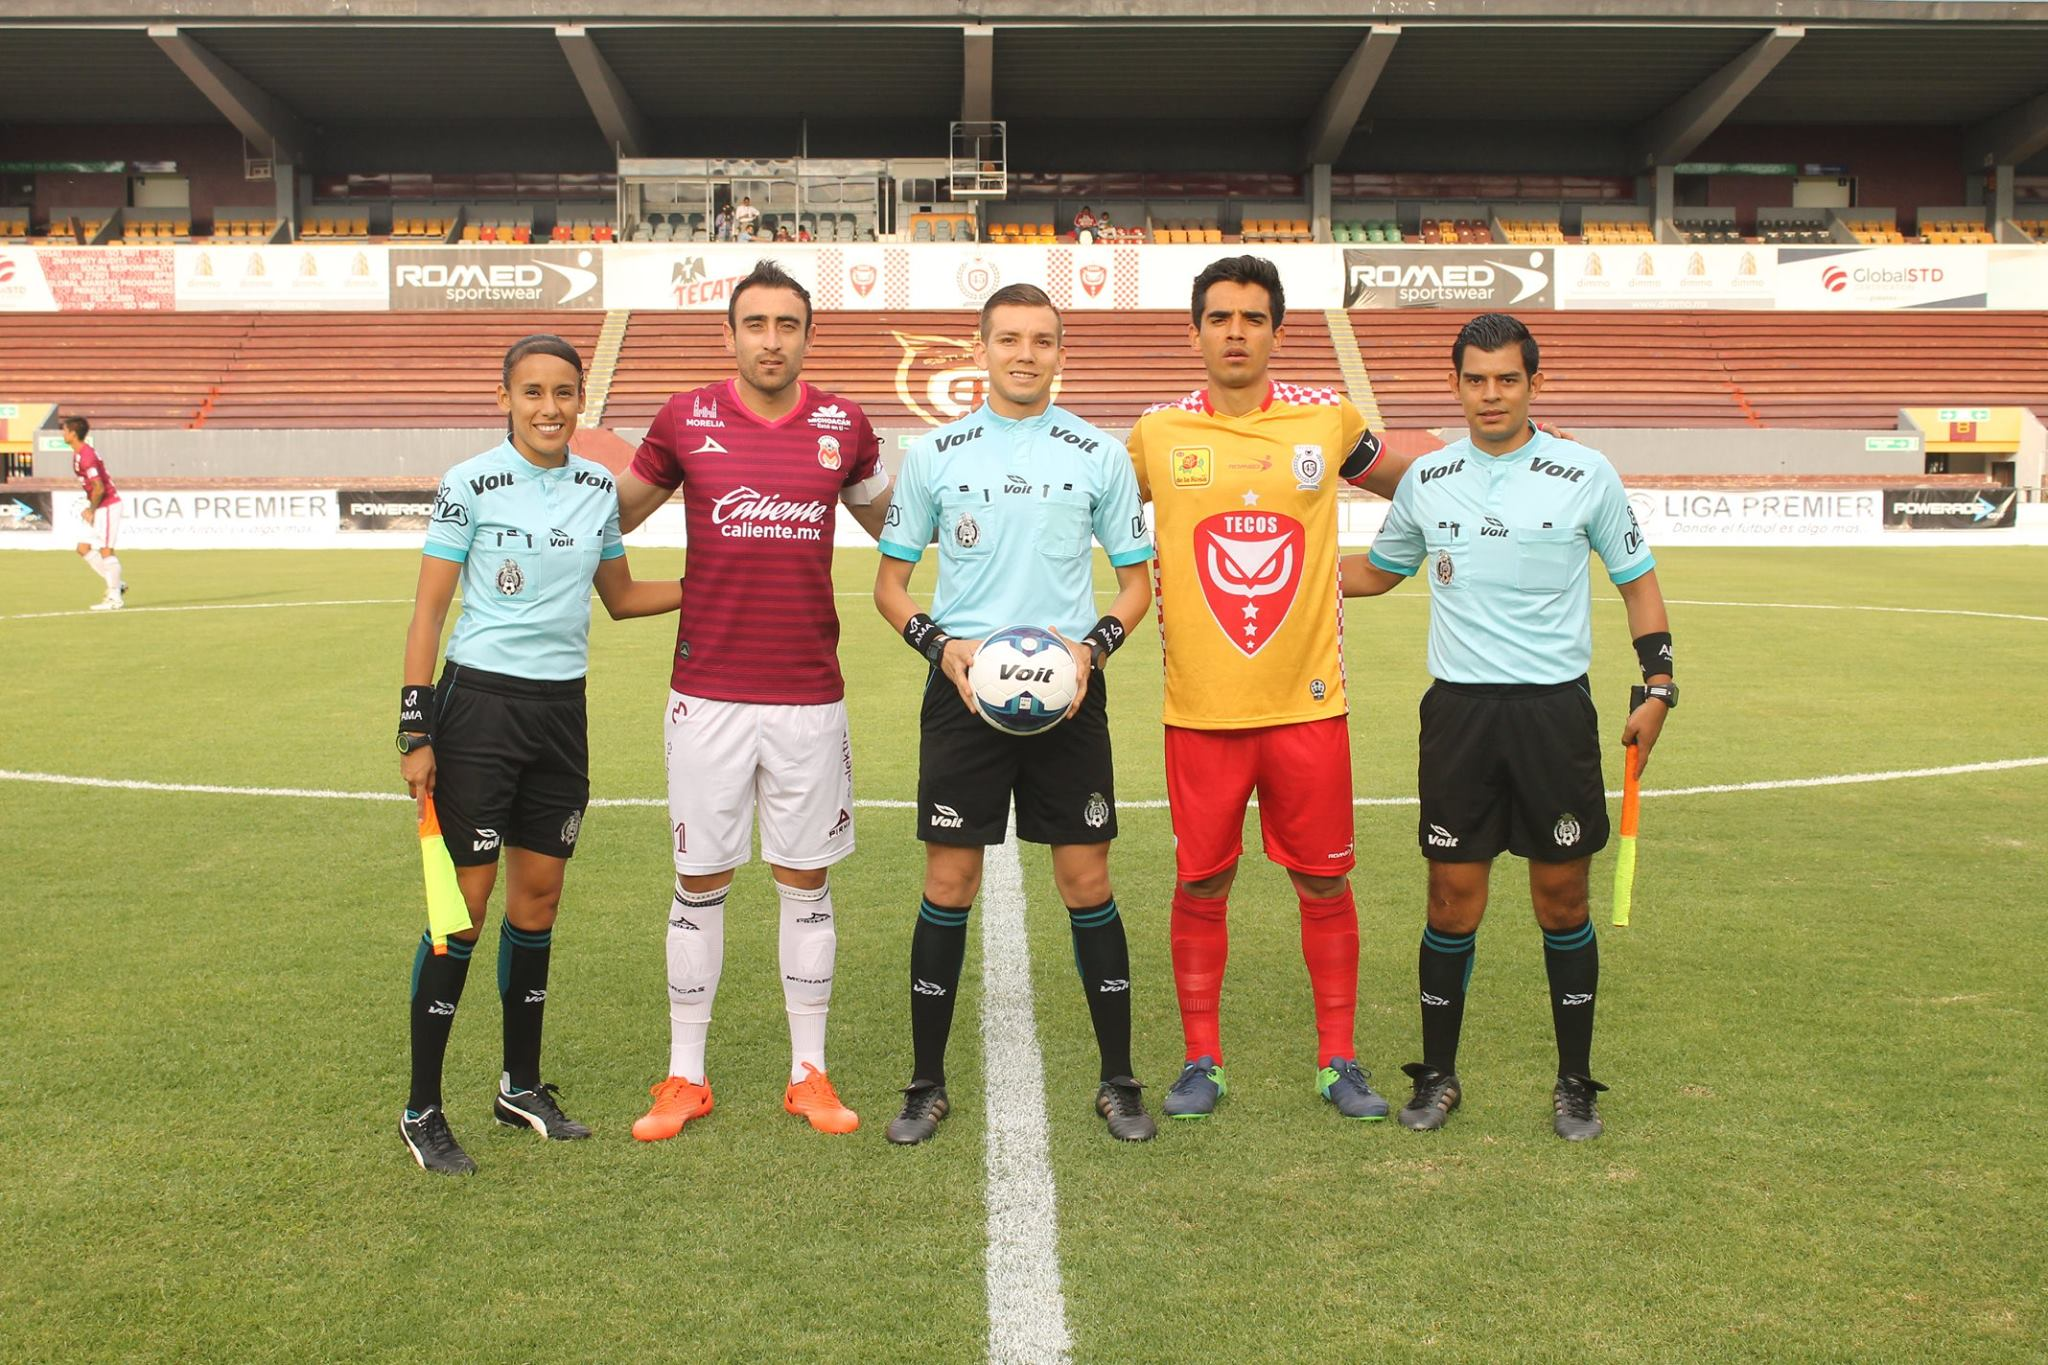 TVC Deportes, Liga Premier, Segunda División, Transmisión, lunes, partido atractivo, televisora